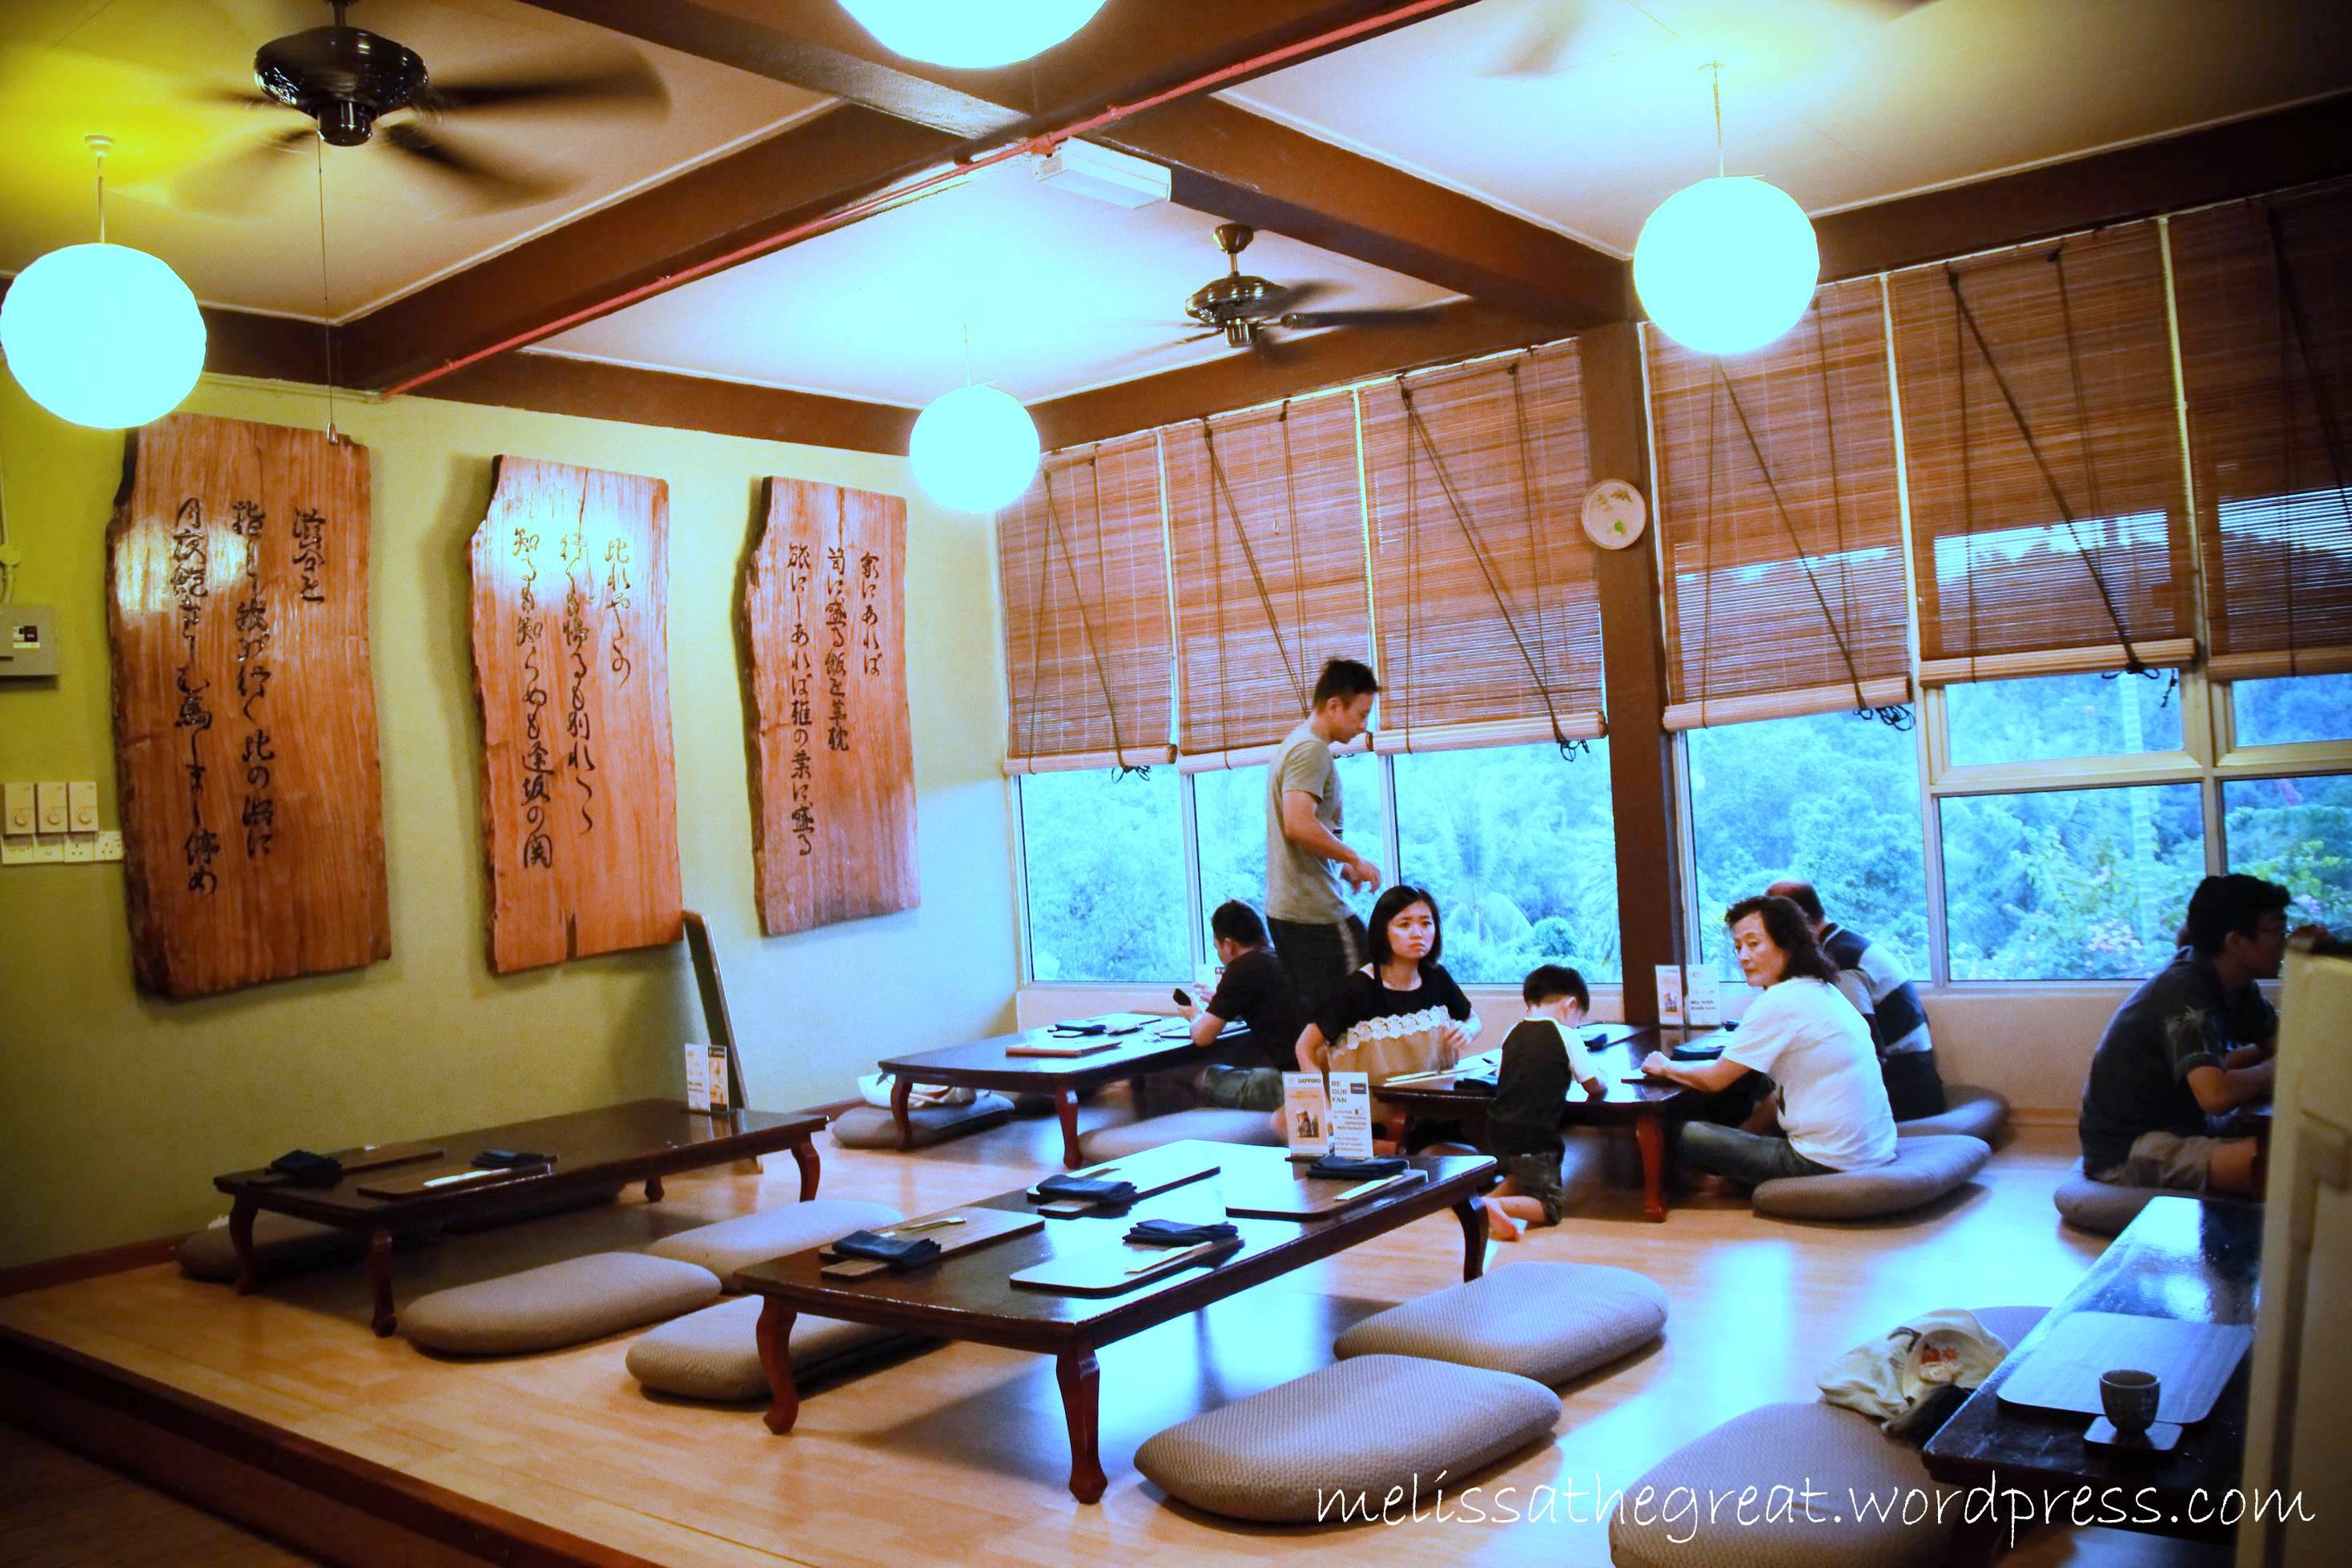 Dinner Unkaizen Japanese Restaurant Langkawi This is  : img6055 from melissathegreat.com size 2937 x 1958 jpeg 651kB